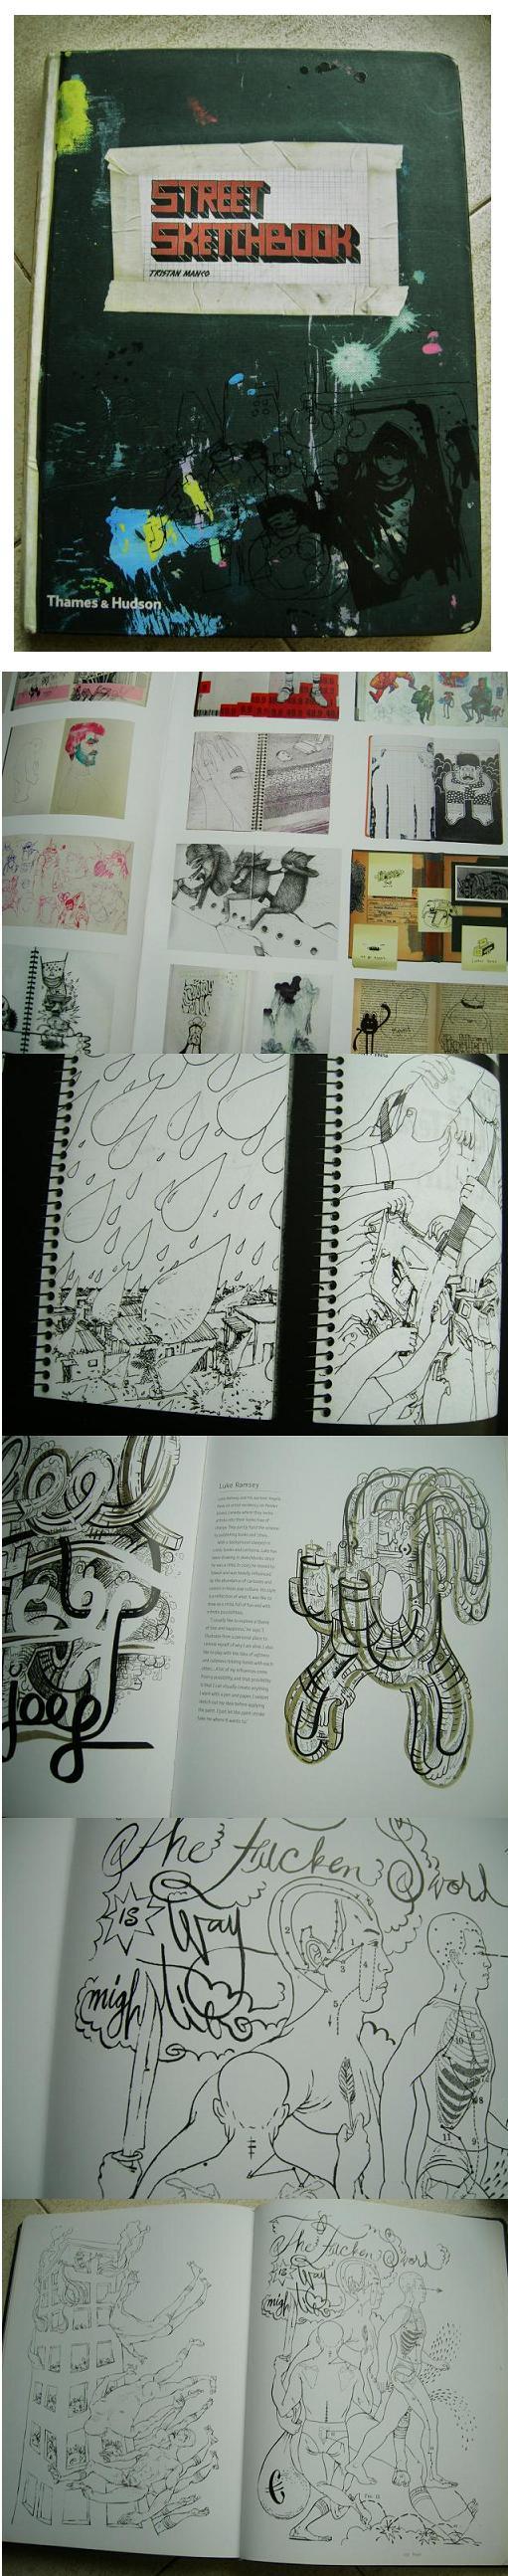 street-sketch-book